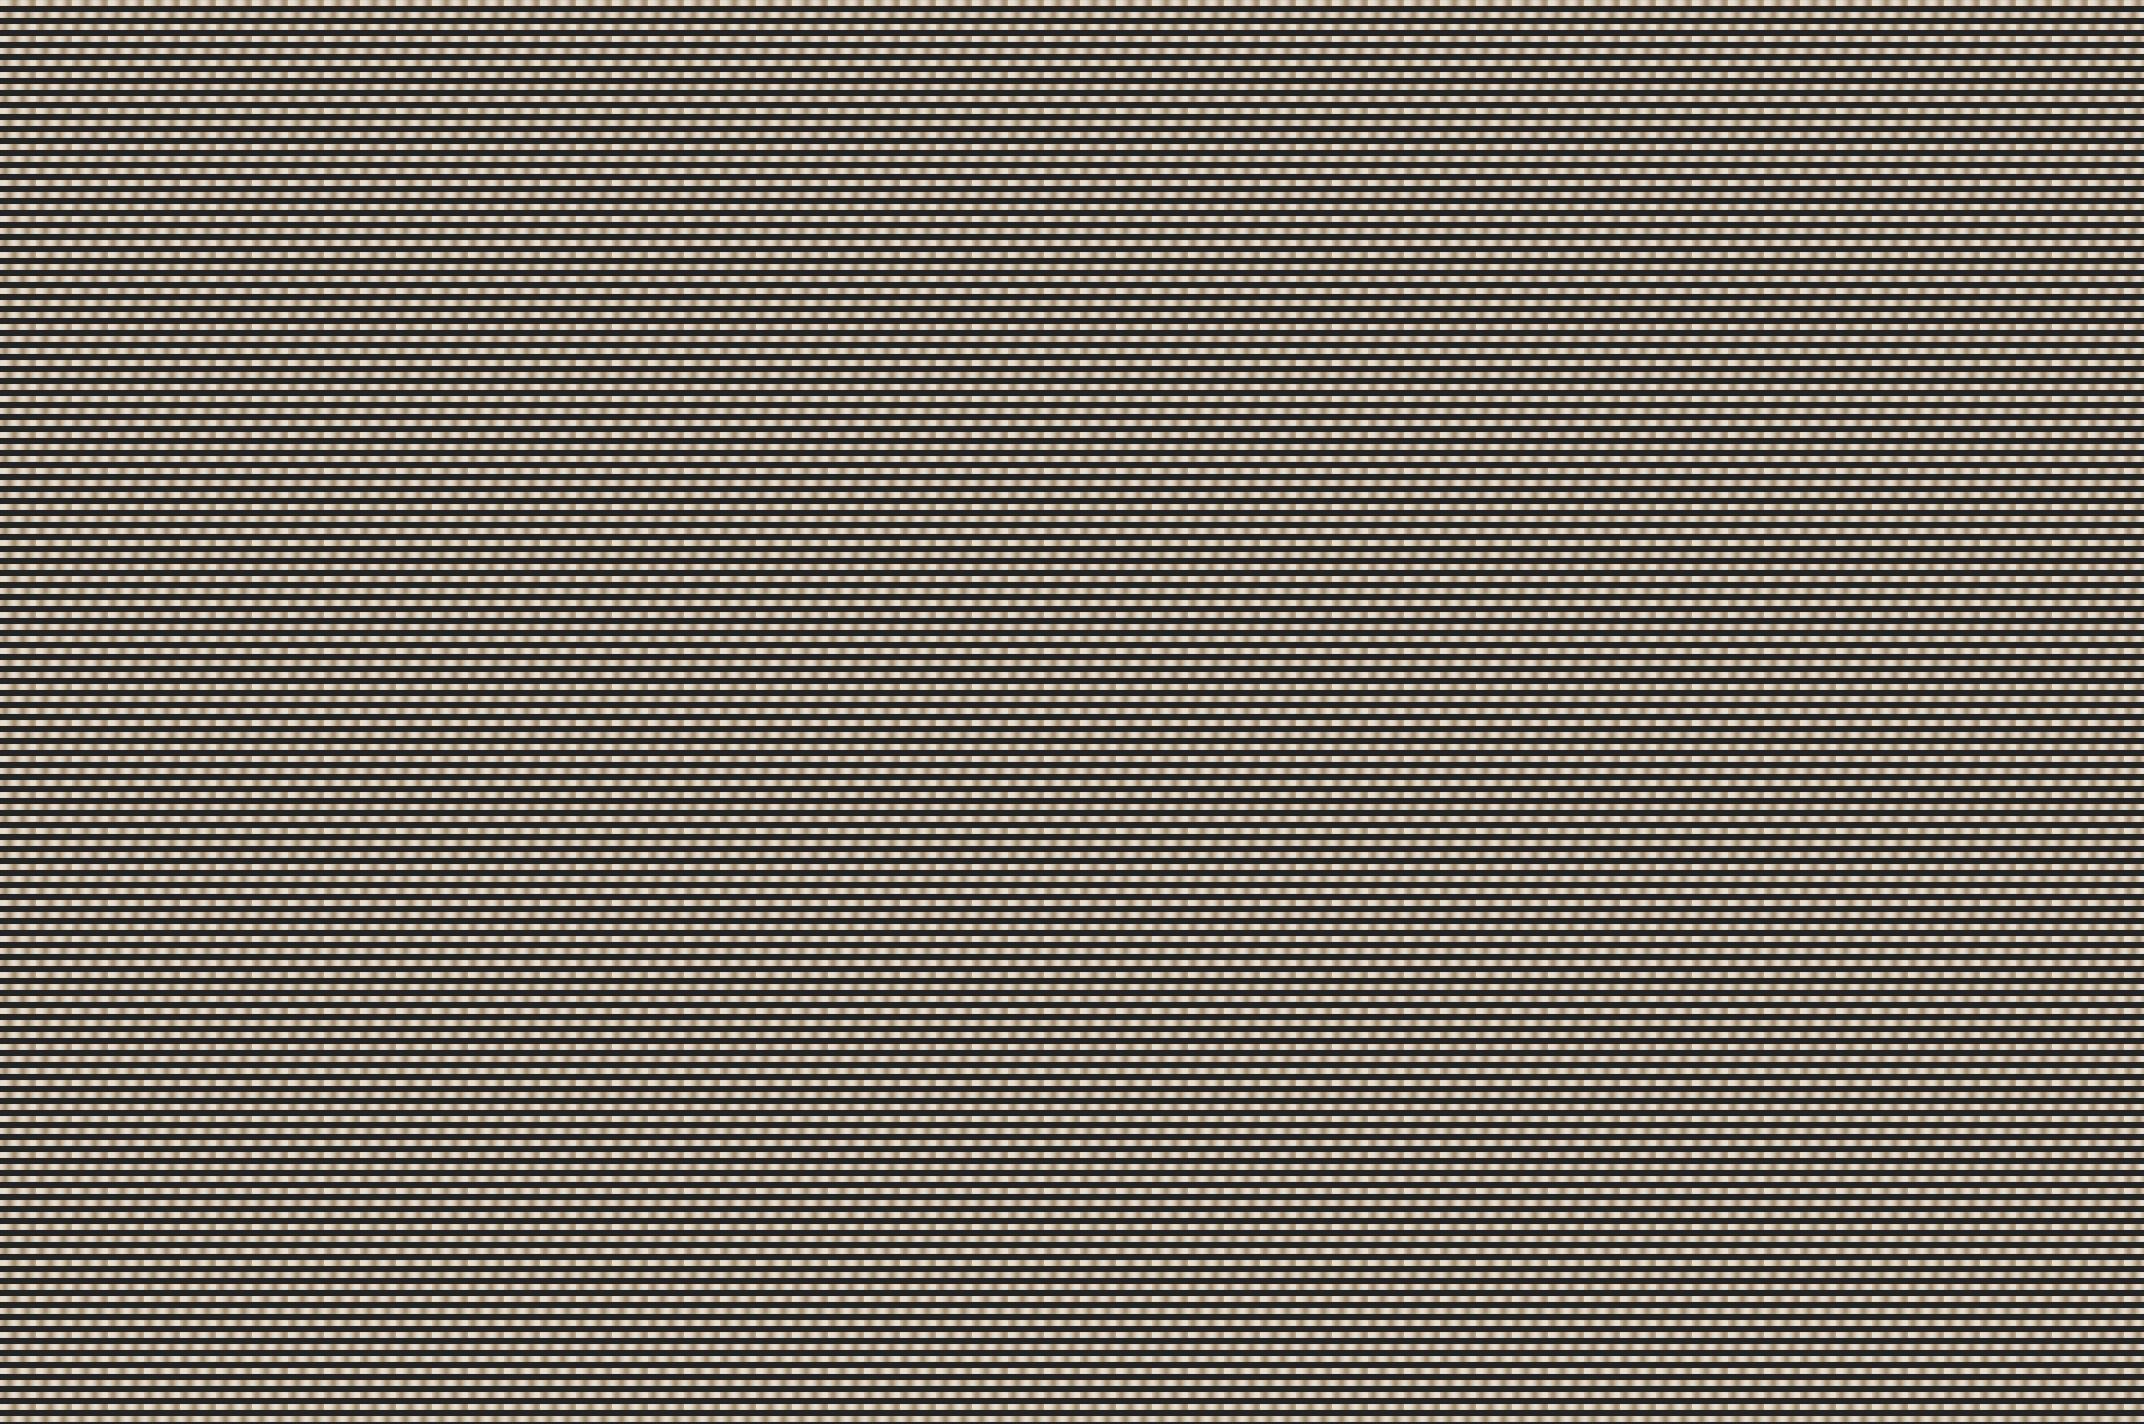 Photoshop Scanlines Texture Overlay